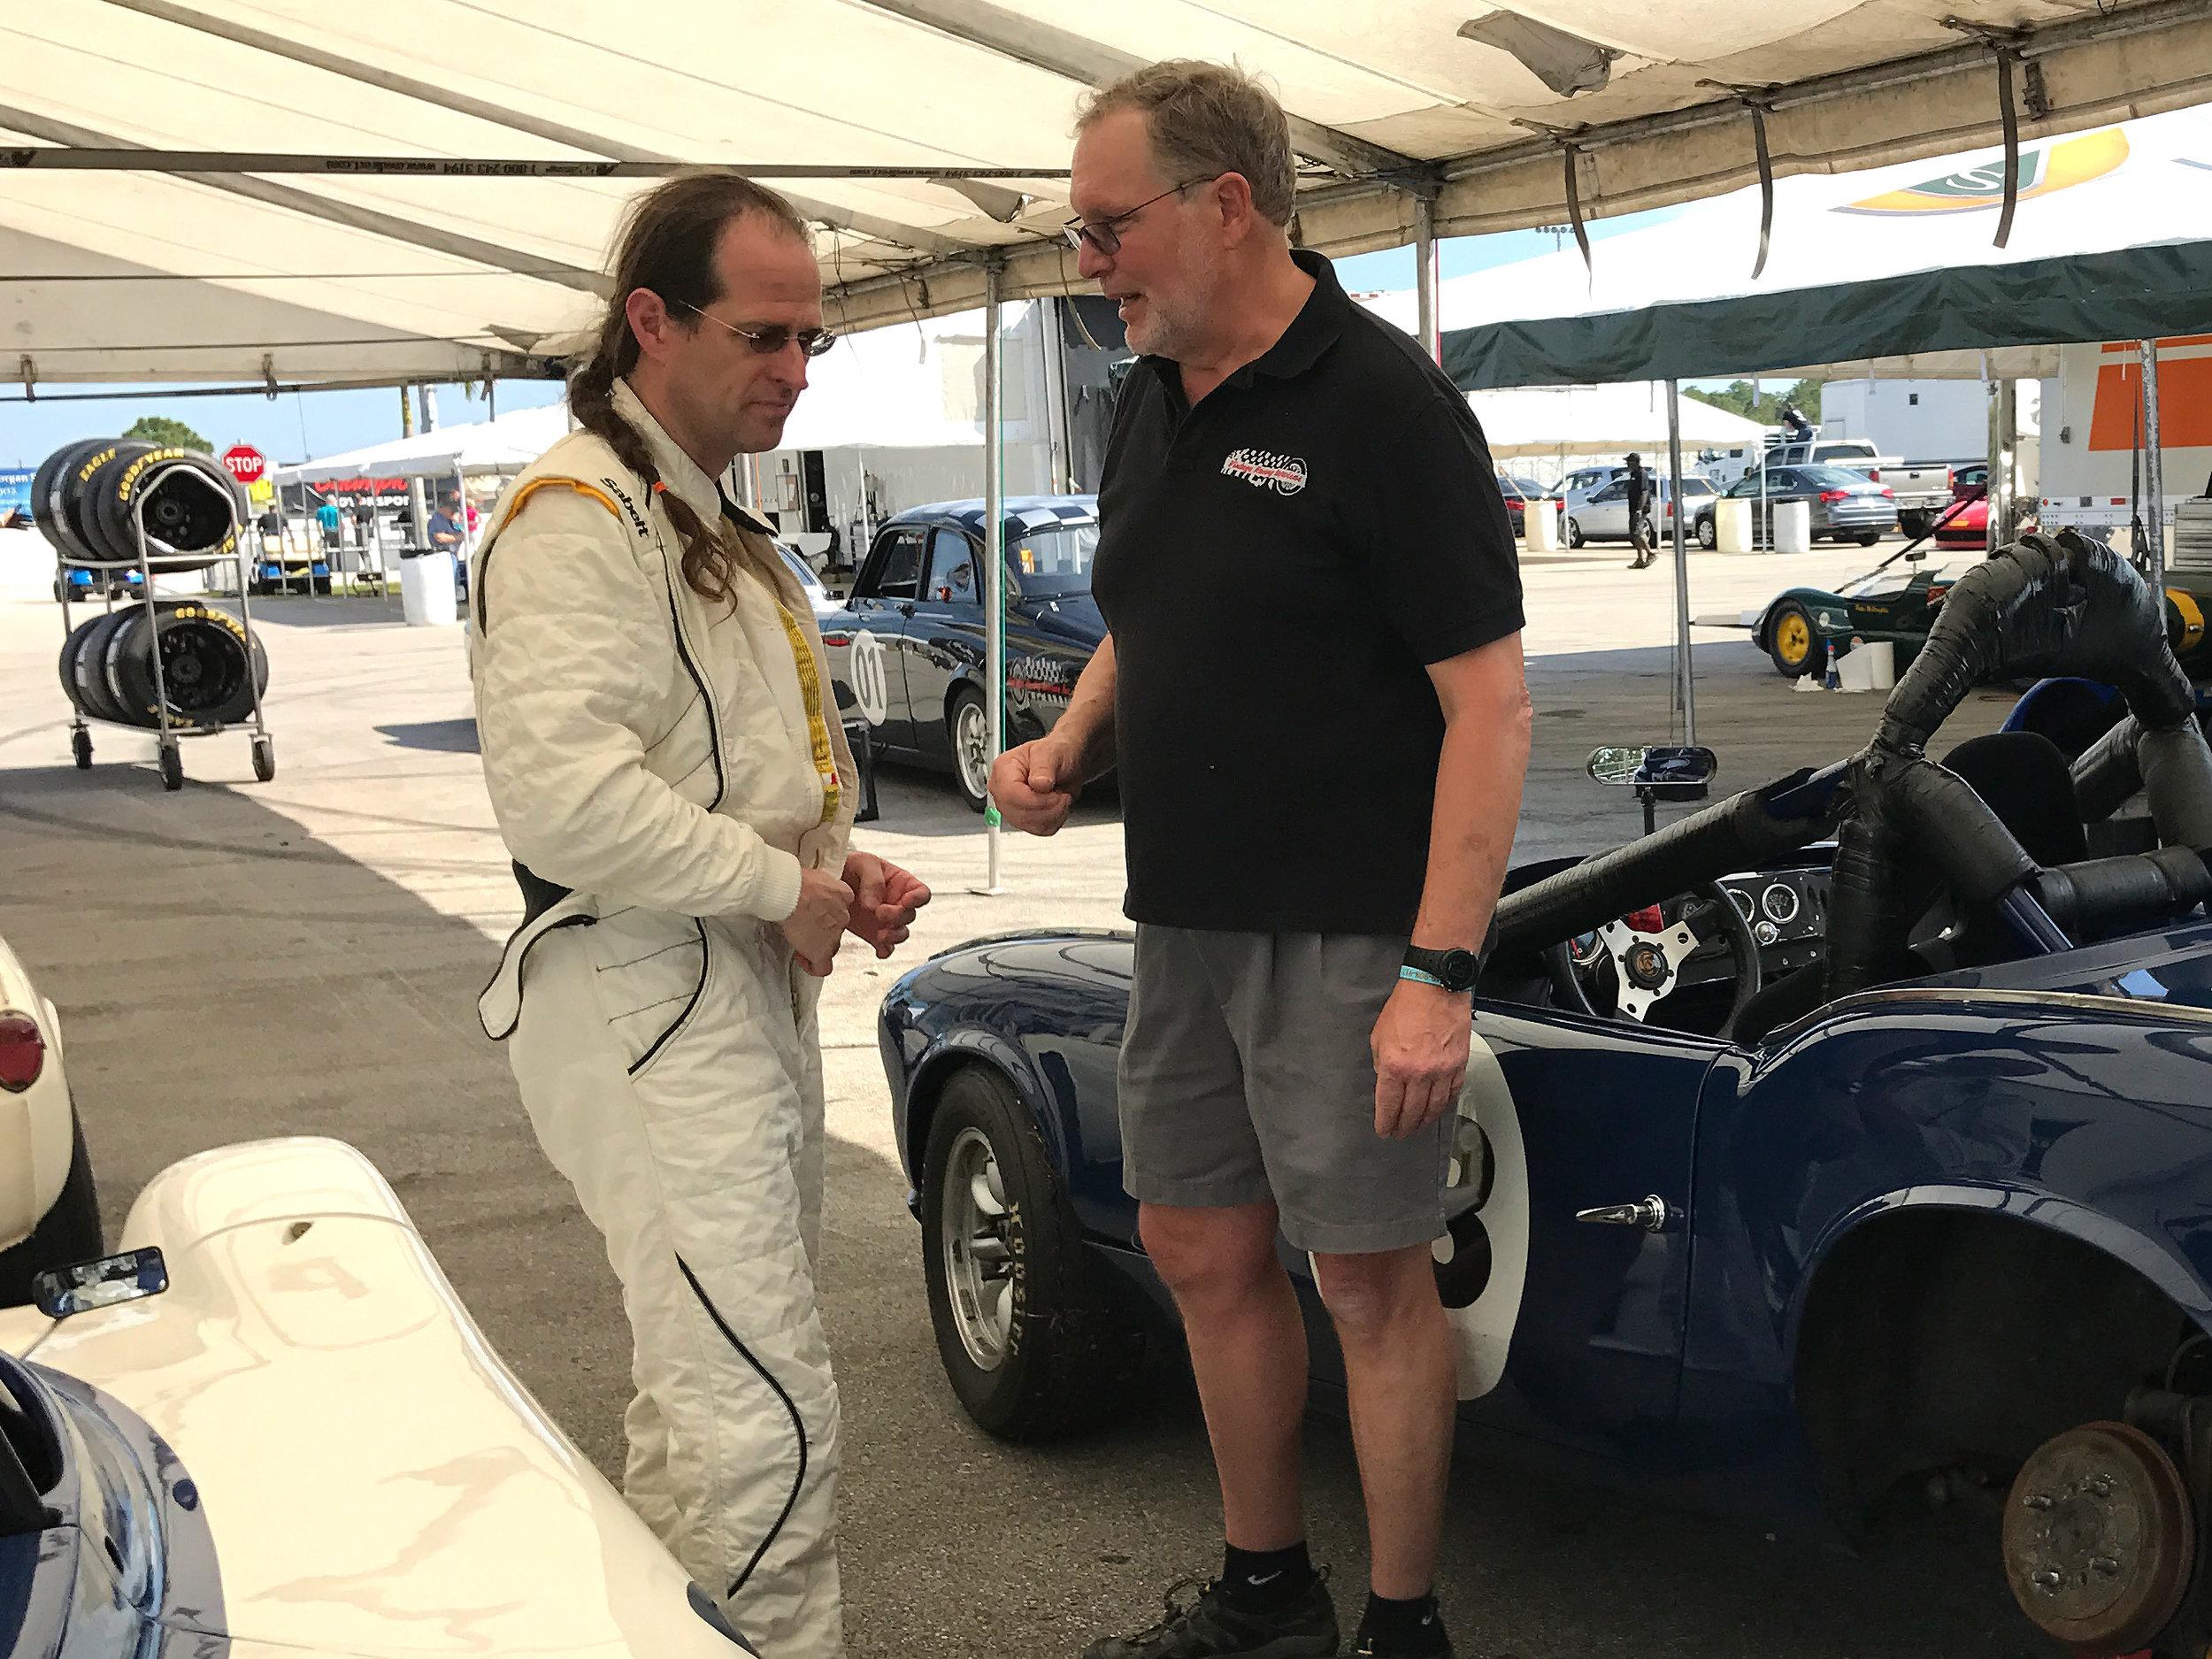 Kent Bain and Chris Mason at Targa 66